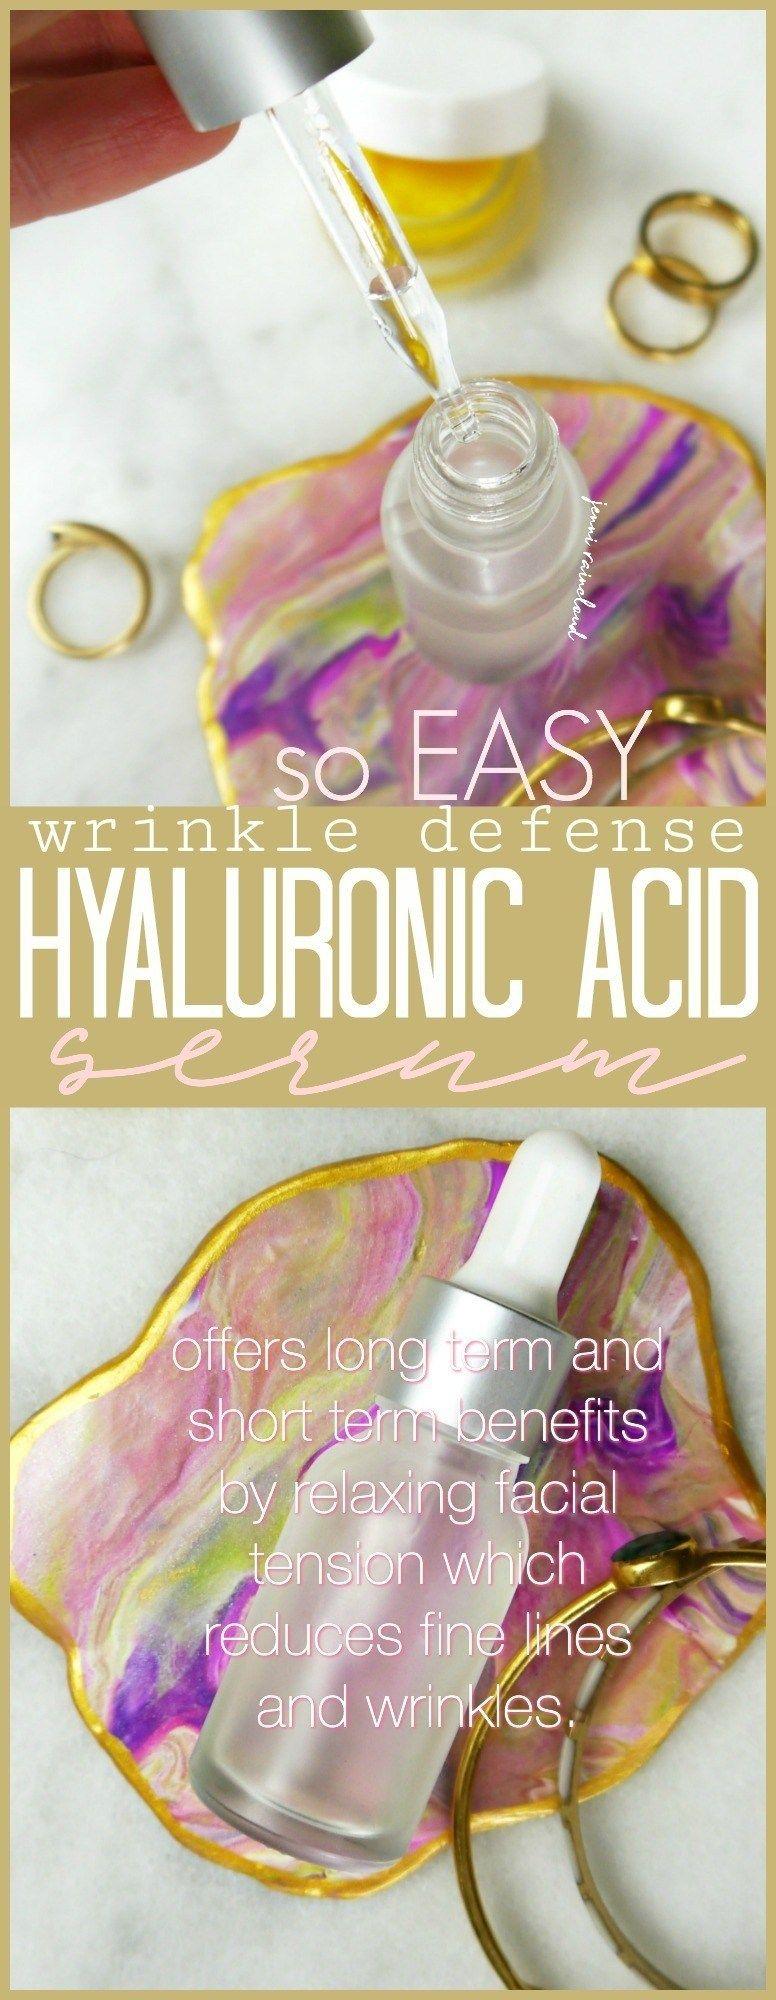 Photo of DIY Hyaluronic Acid Wrinkle Defense Serum – Jenni Raincloud